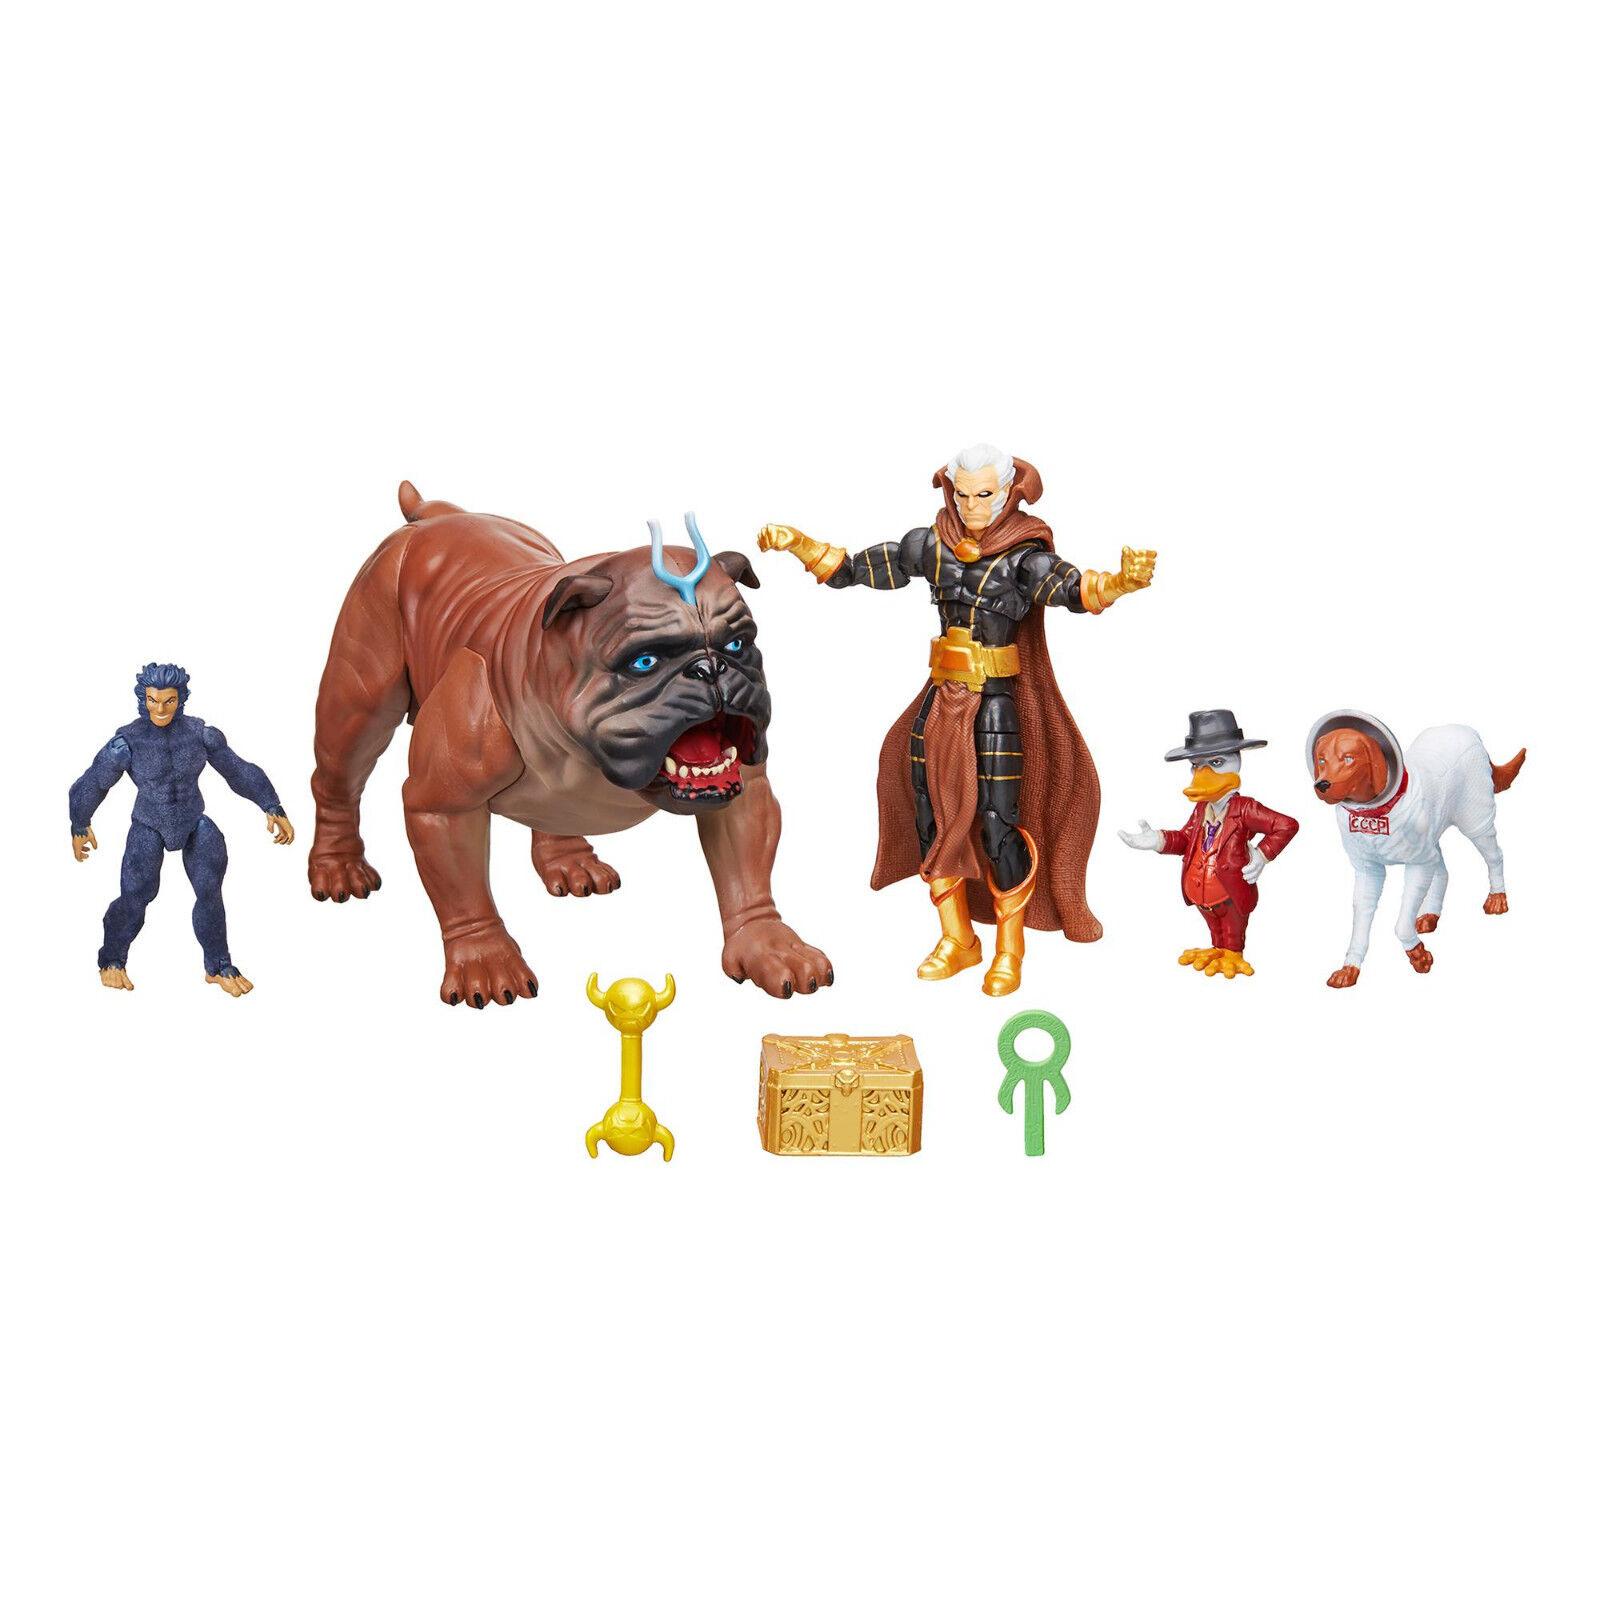 SDCC 2016 Marvel The Collector's vault Legends Figures Hasbro